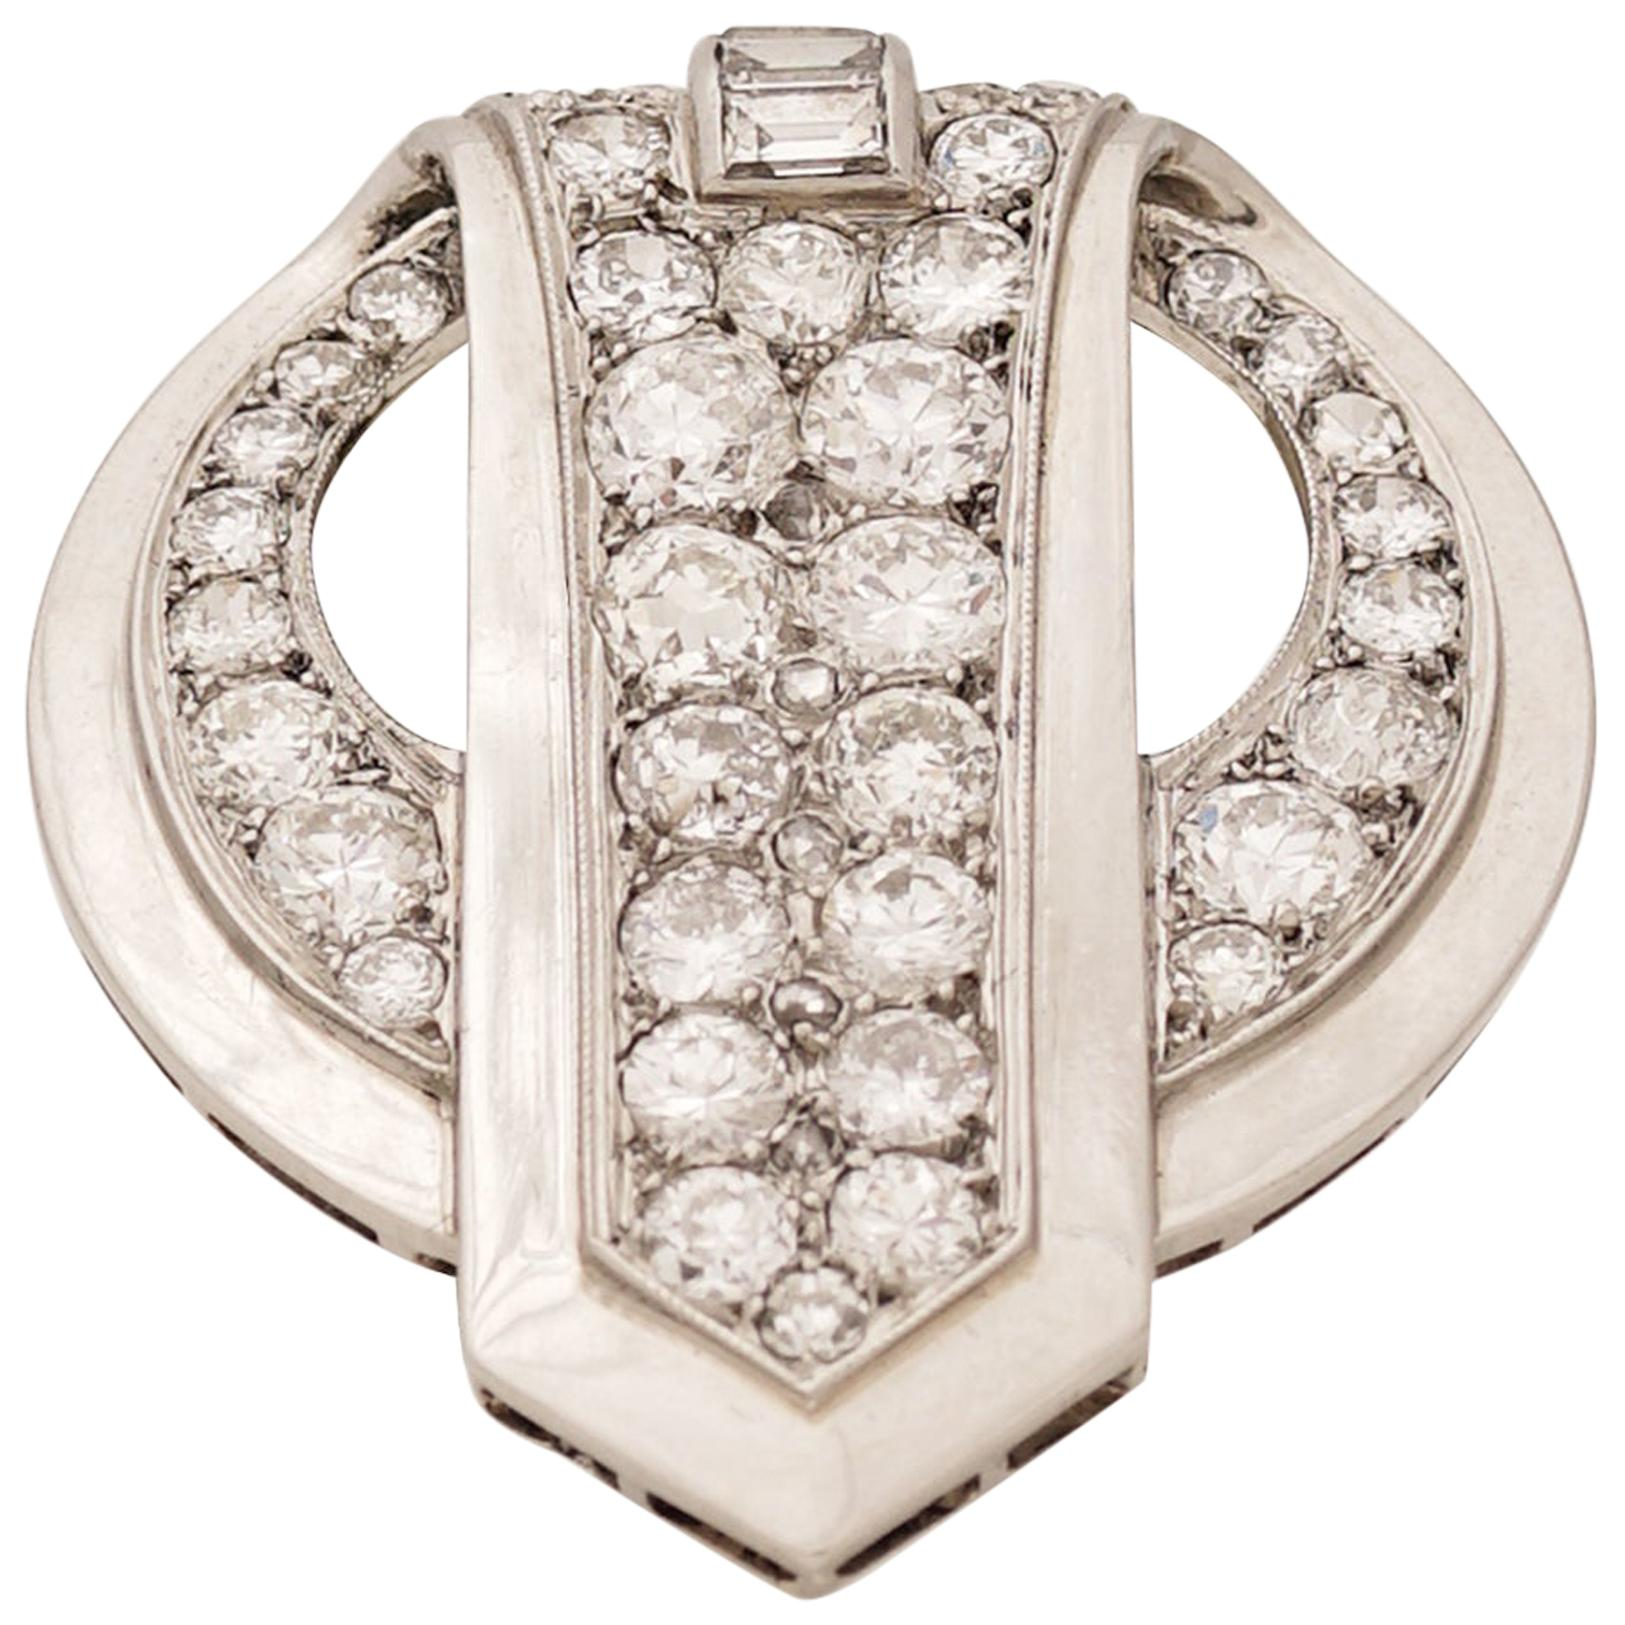 Chaumet, Paris, a Diamond and Platinum Clip, circa 1930